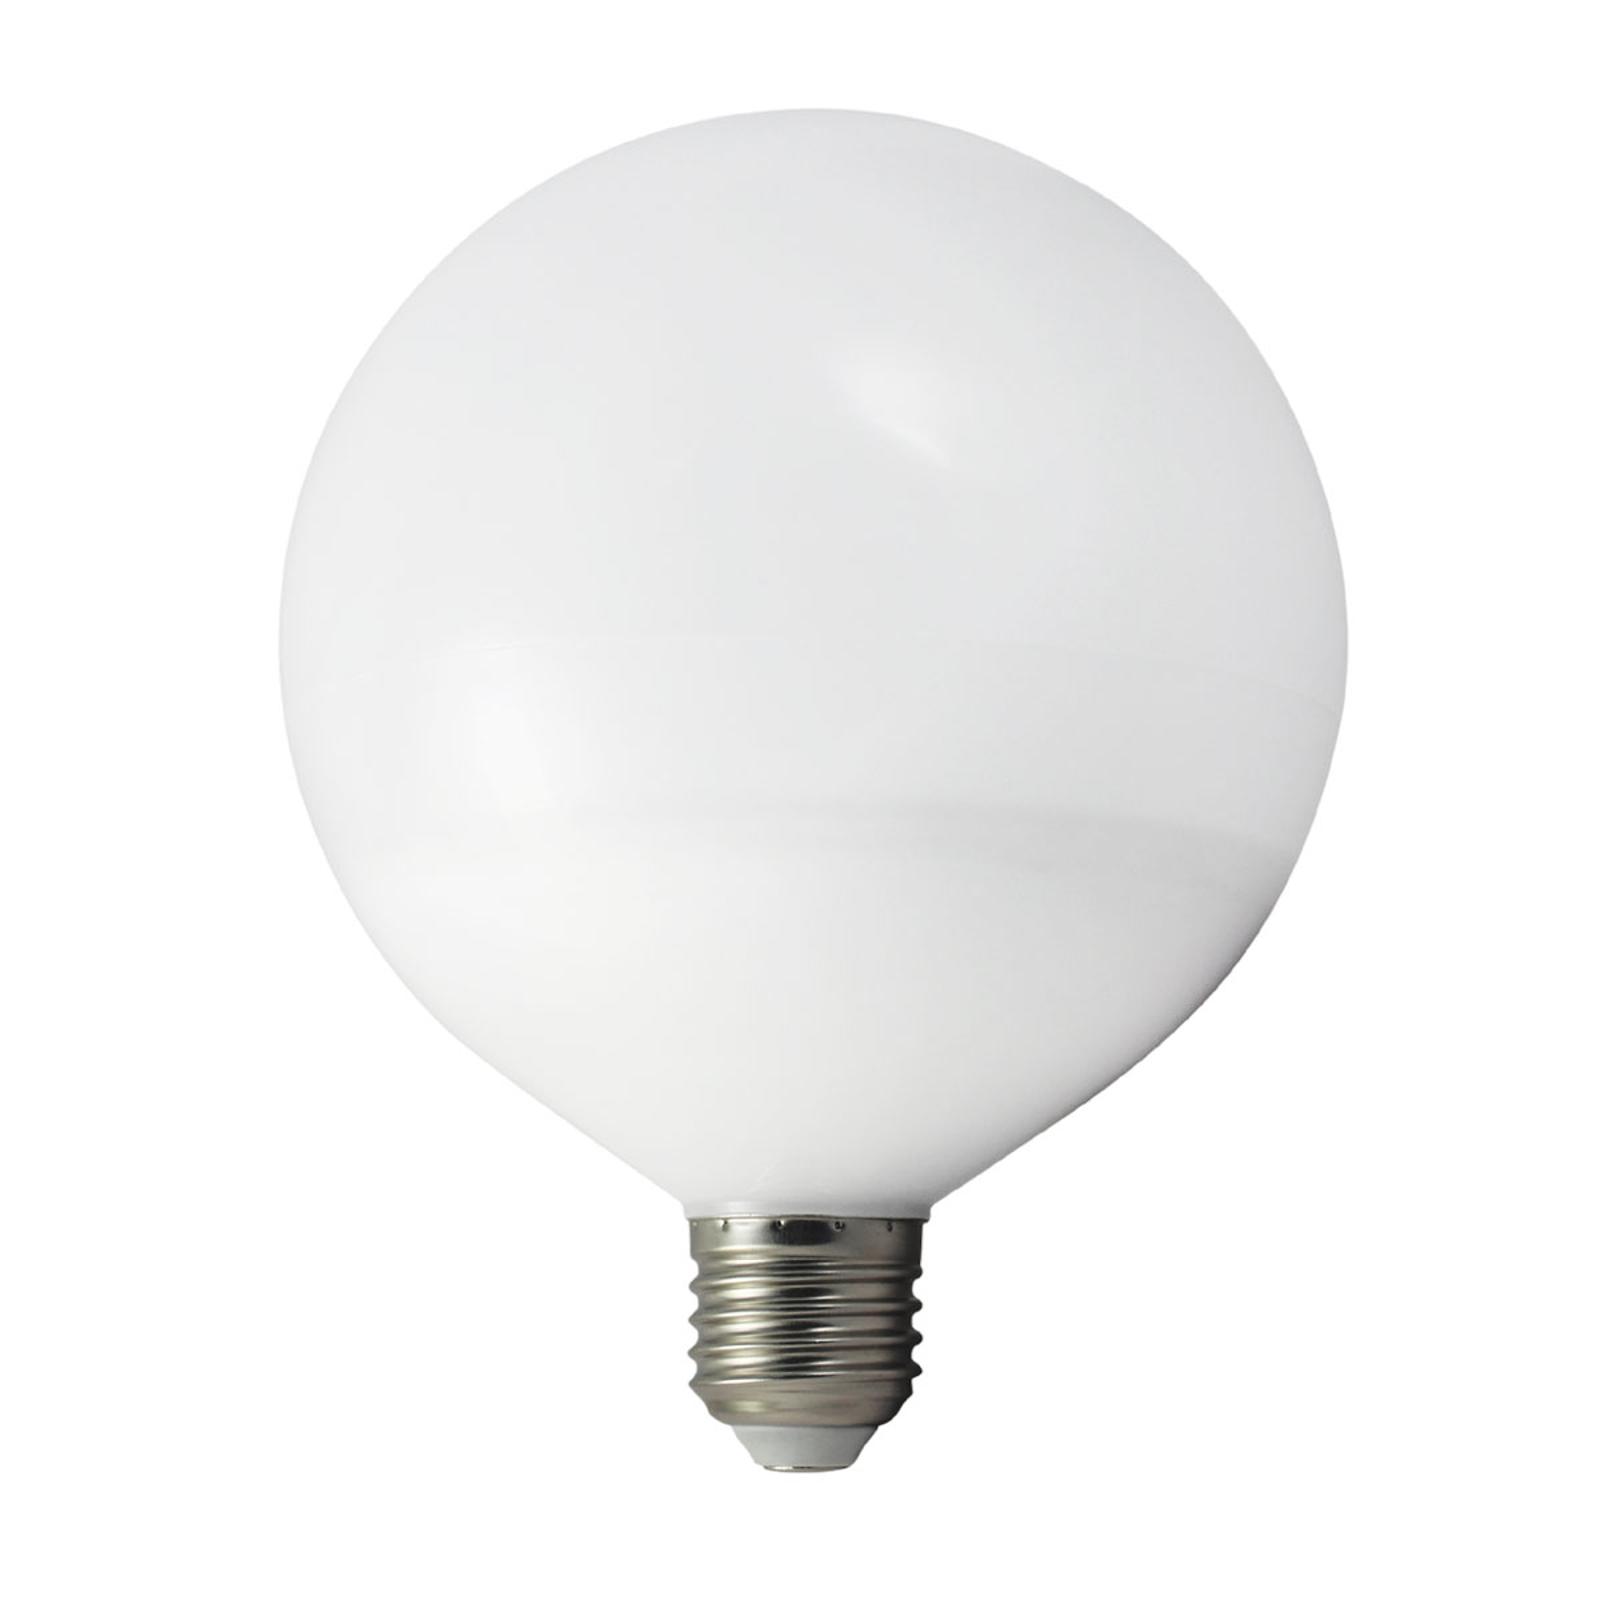 Ampoule globe LED E27 15W 827, blanc chaud